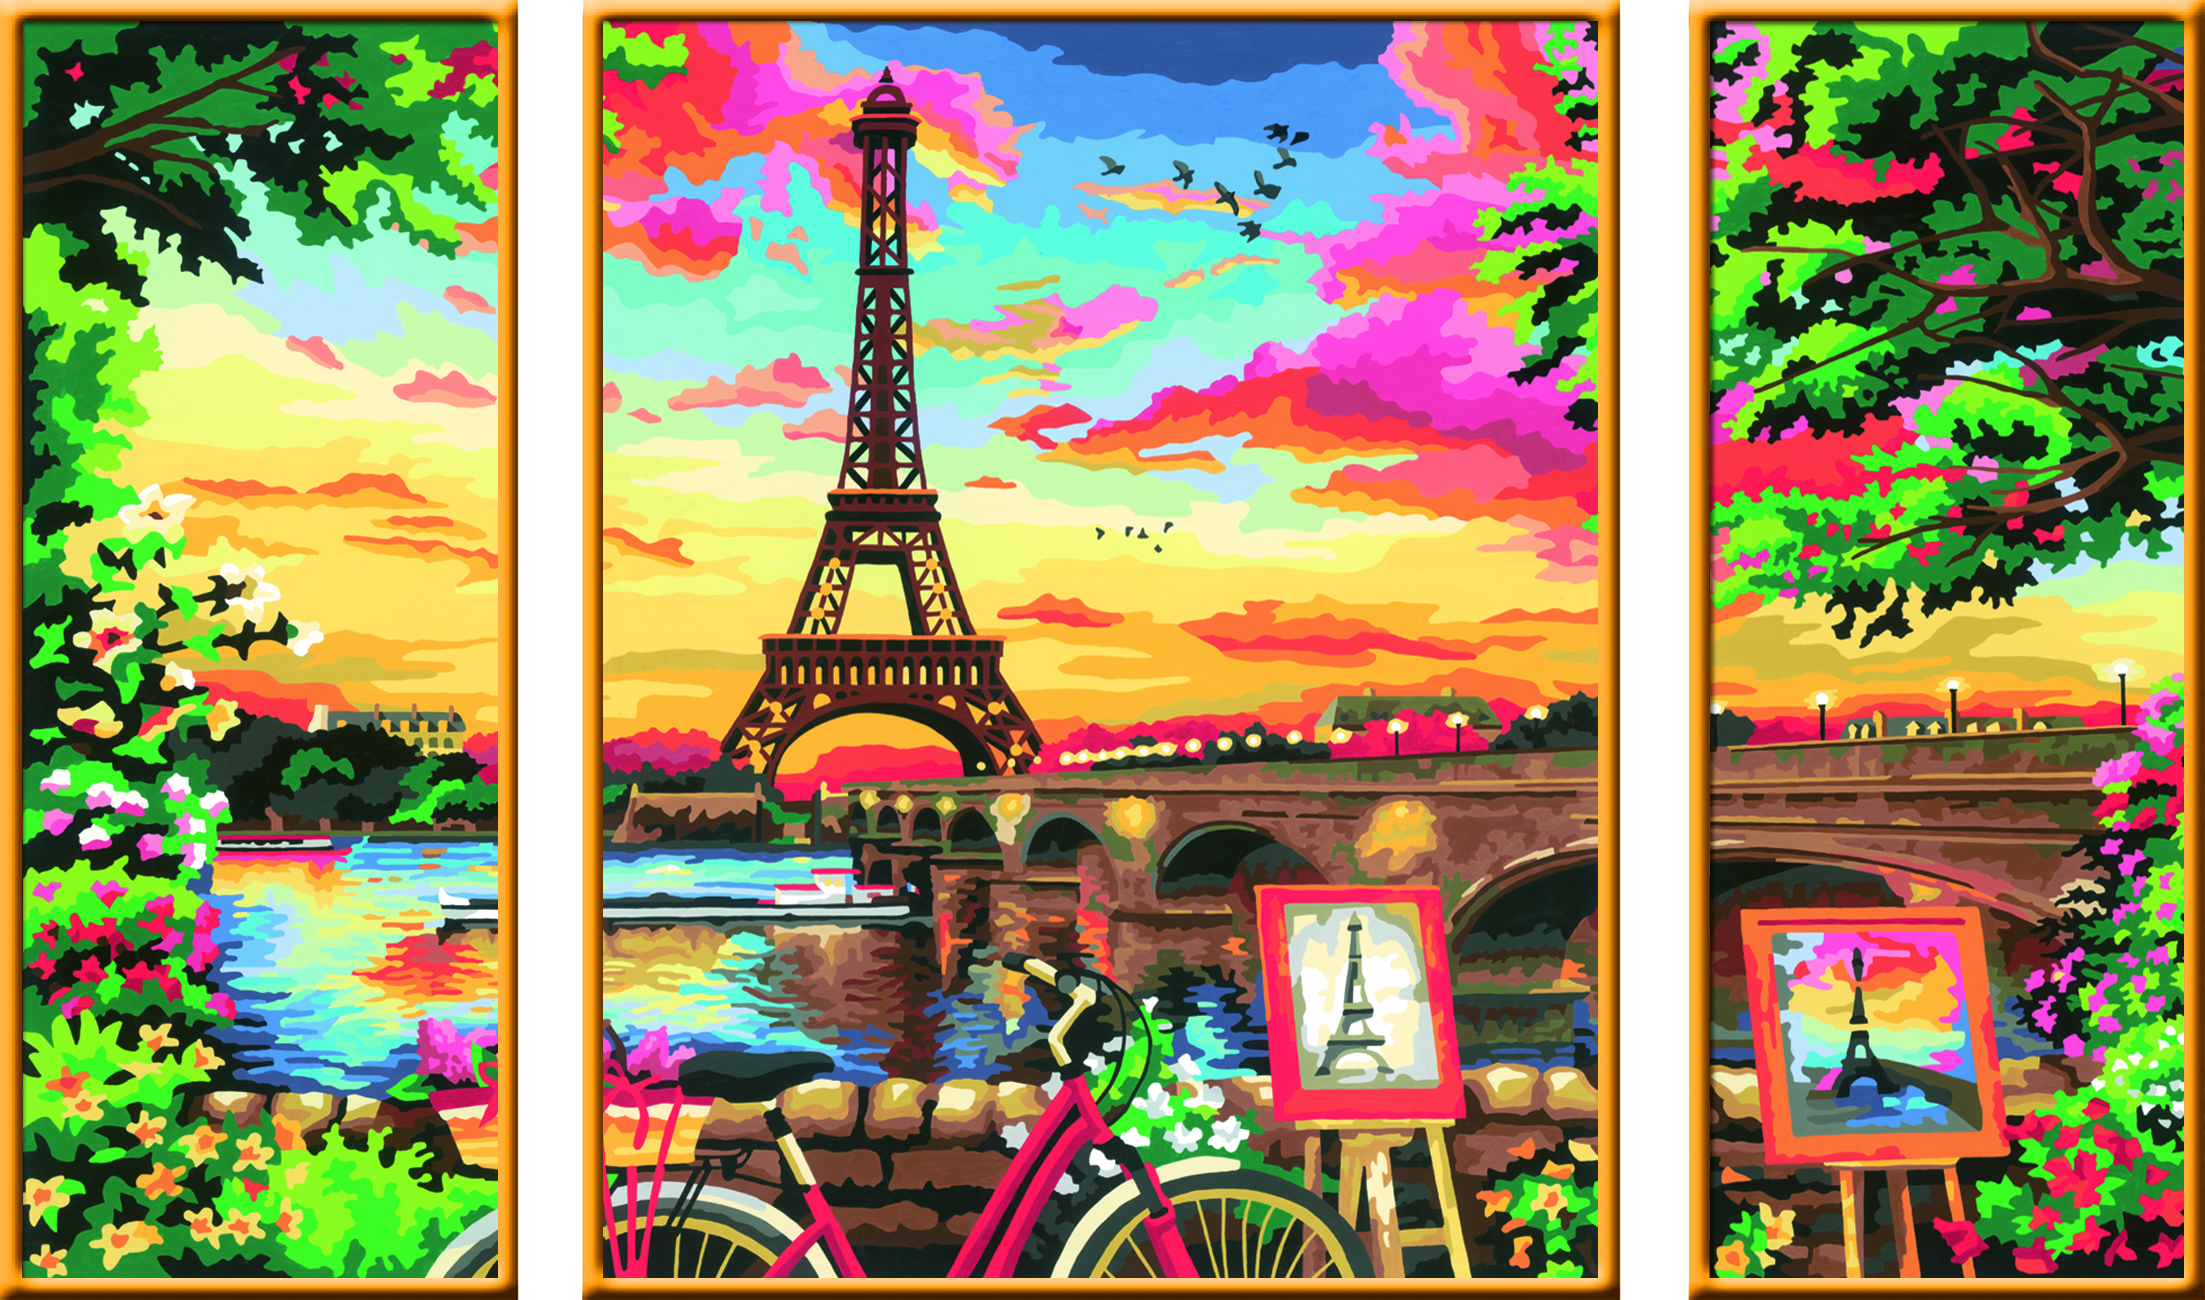 Ravensburger Malen nach Zahlen Serie Premium Triptychon - Wellness